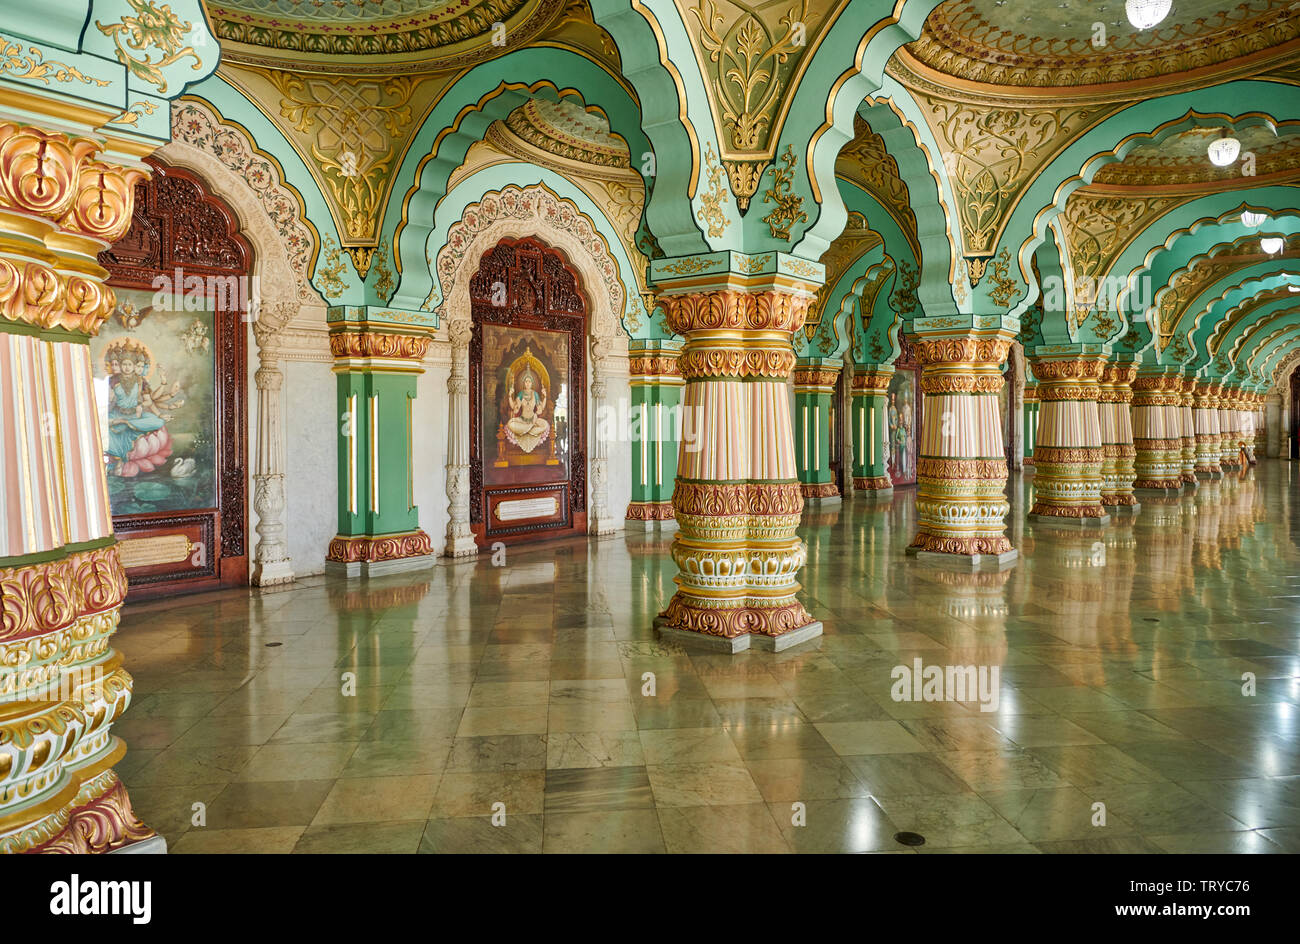 Audience hall, Public Durbar Hall, interior shot of Mysore Palace or ambavilas palace, Mysore, Hassan, Karnataka, India Stock Photo